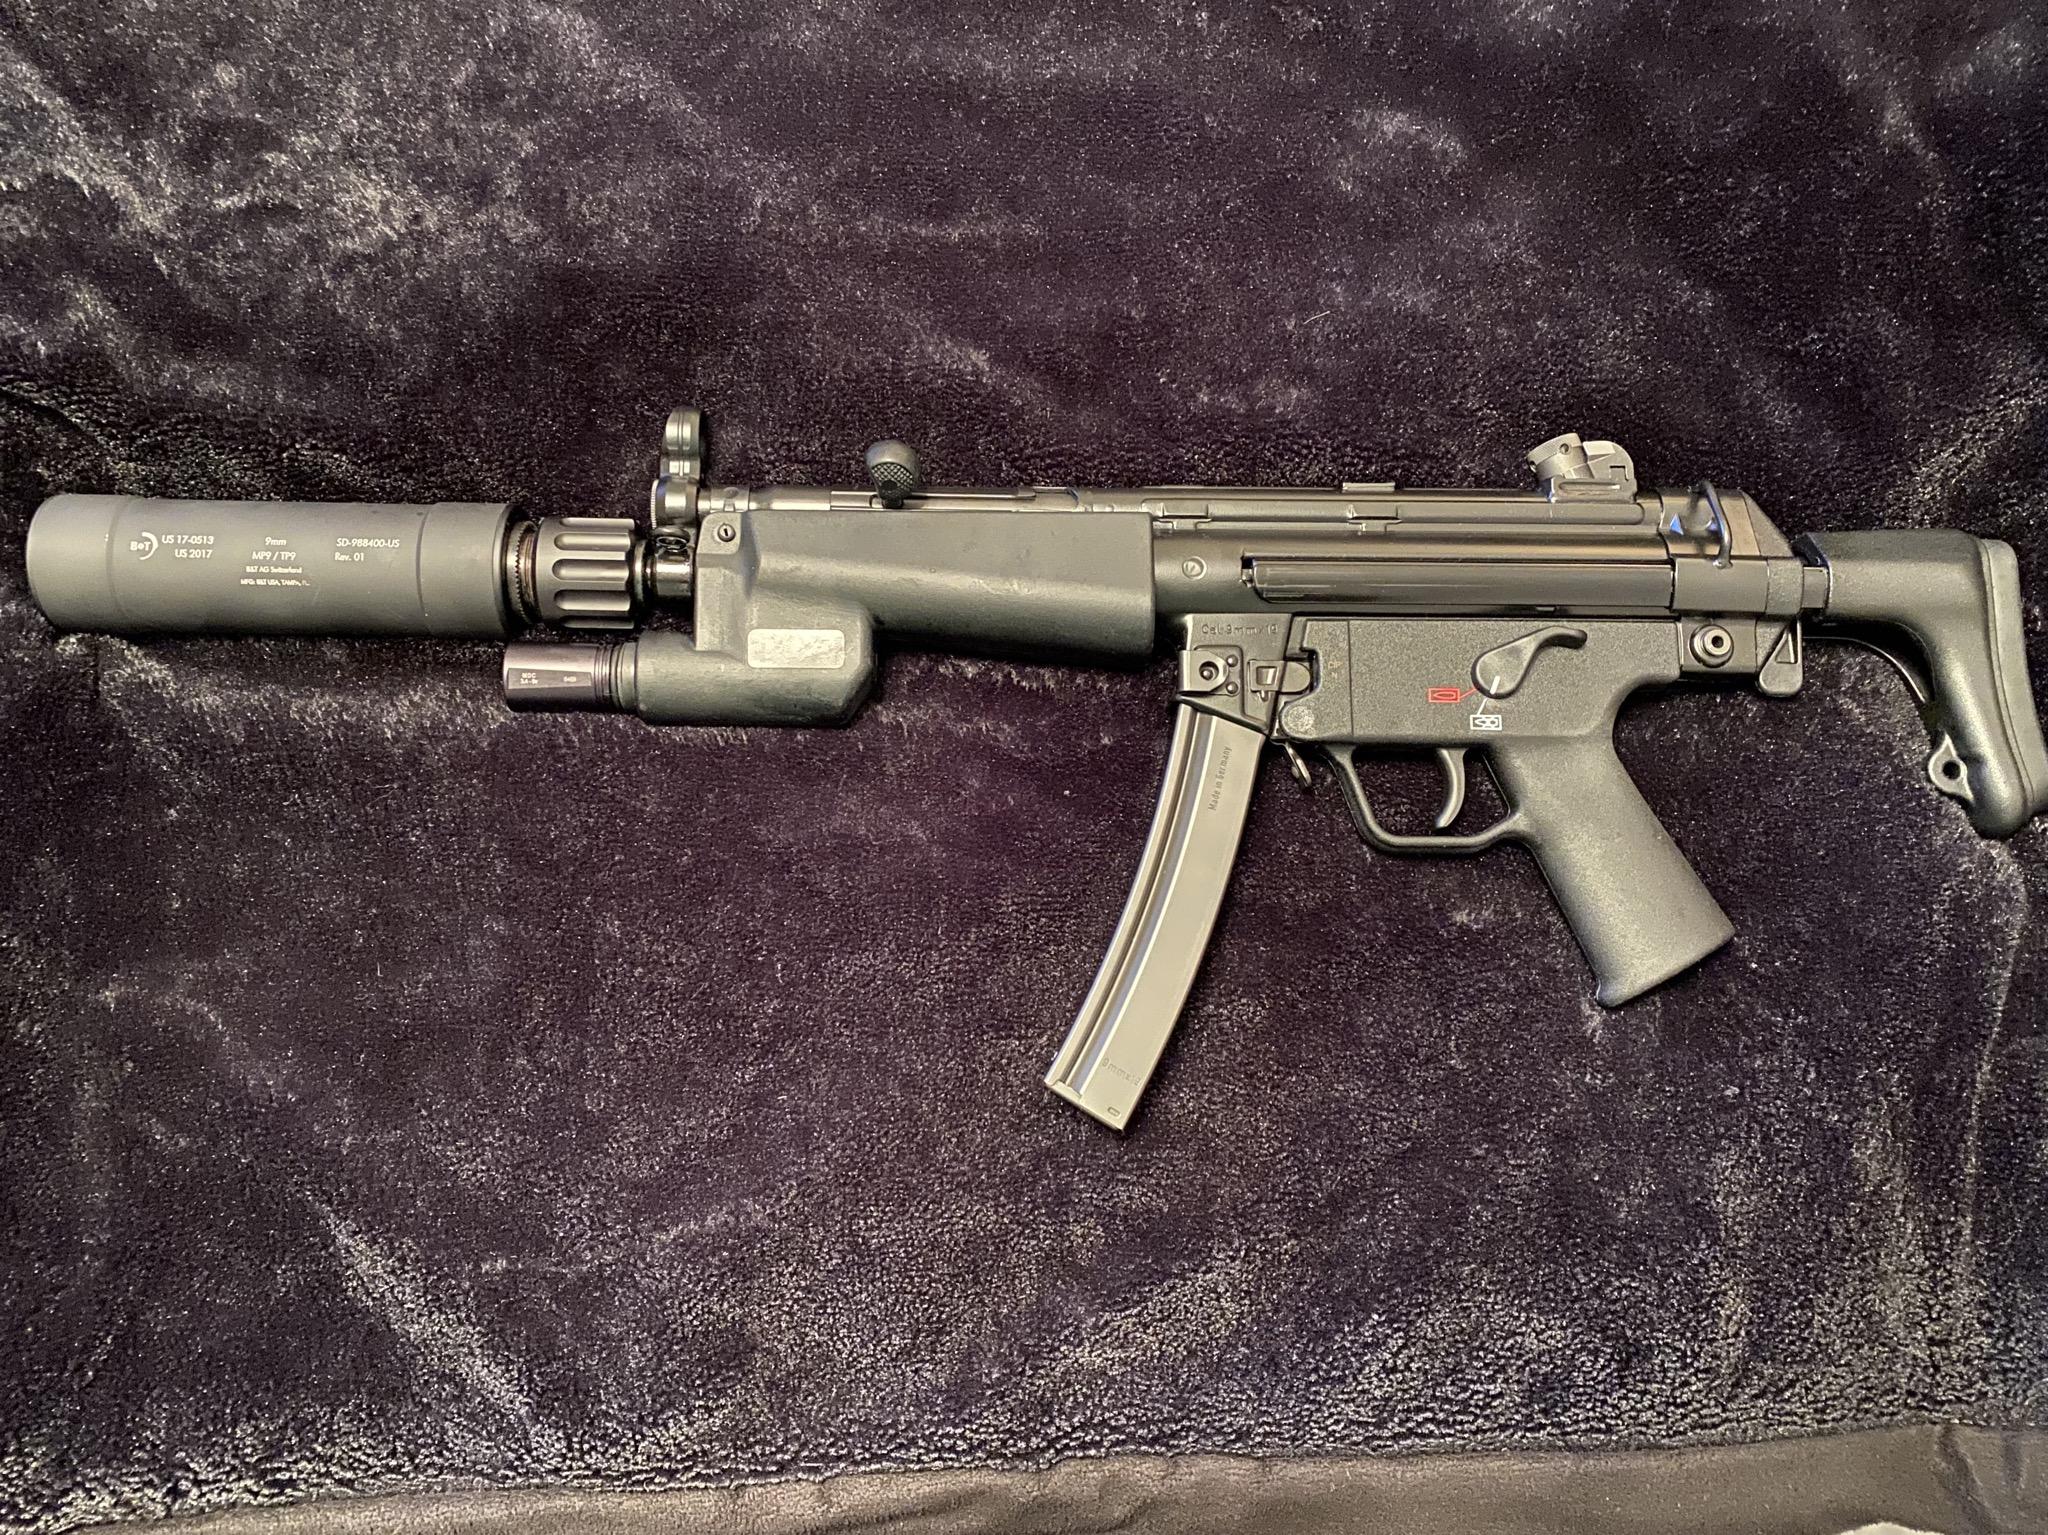 MP-5 Surefire 328LM or 628LM suppressor clearance and recommendation?-c3960a8b-0f6b-459c-ac3e-7615ea4ec84a_1580574656896.jpeg